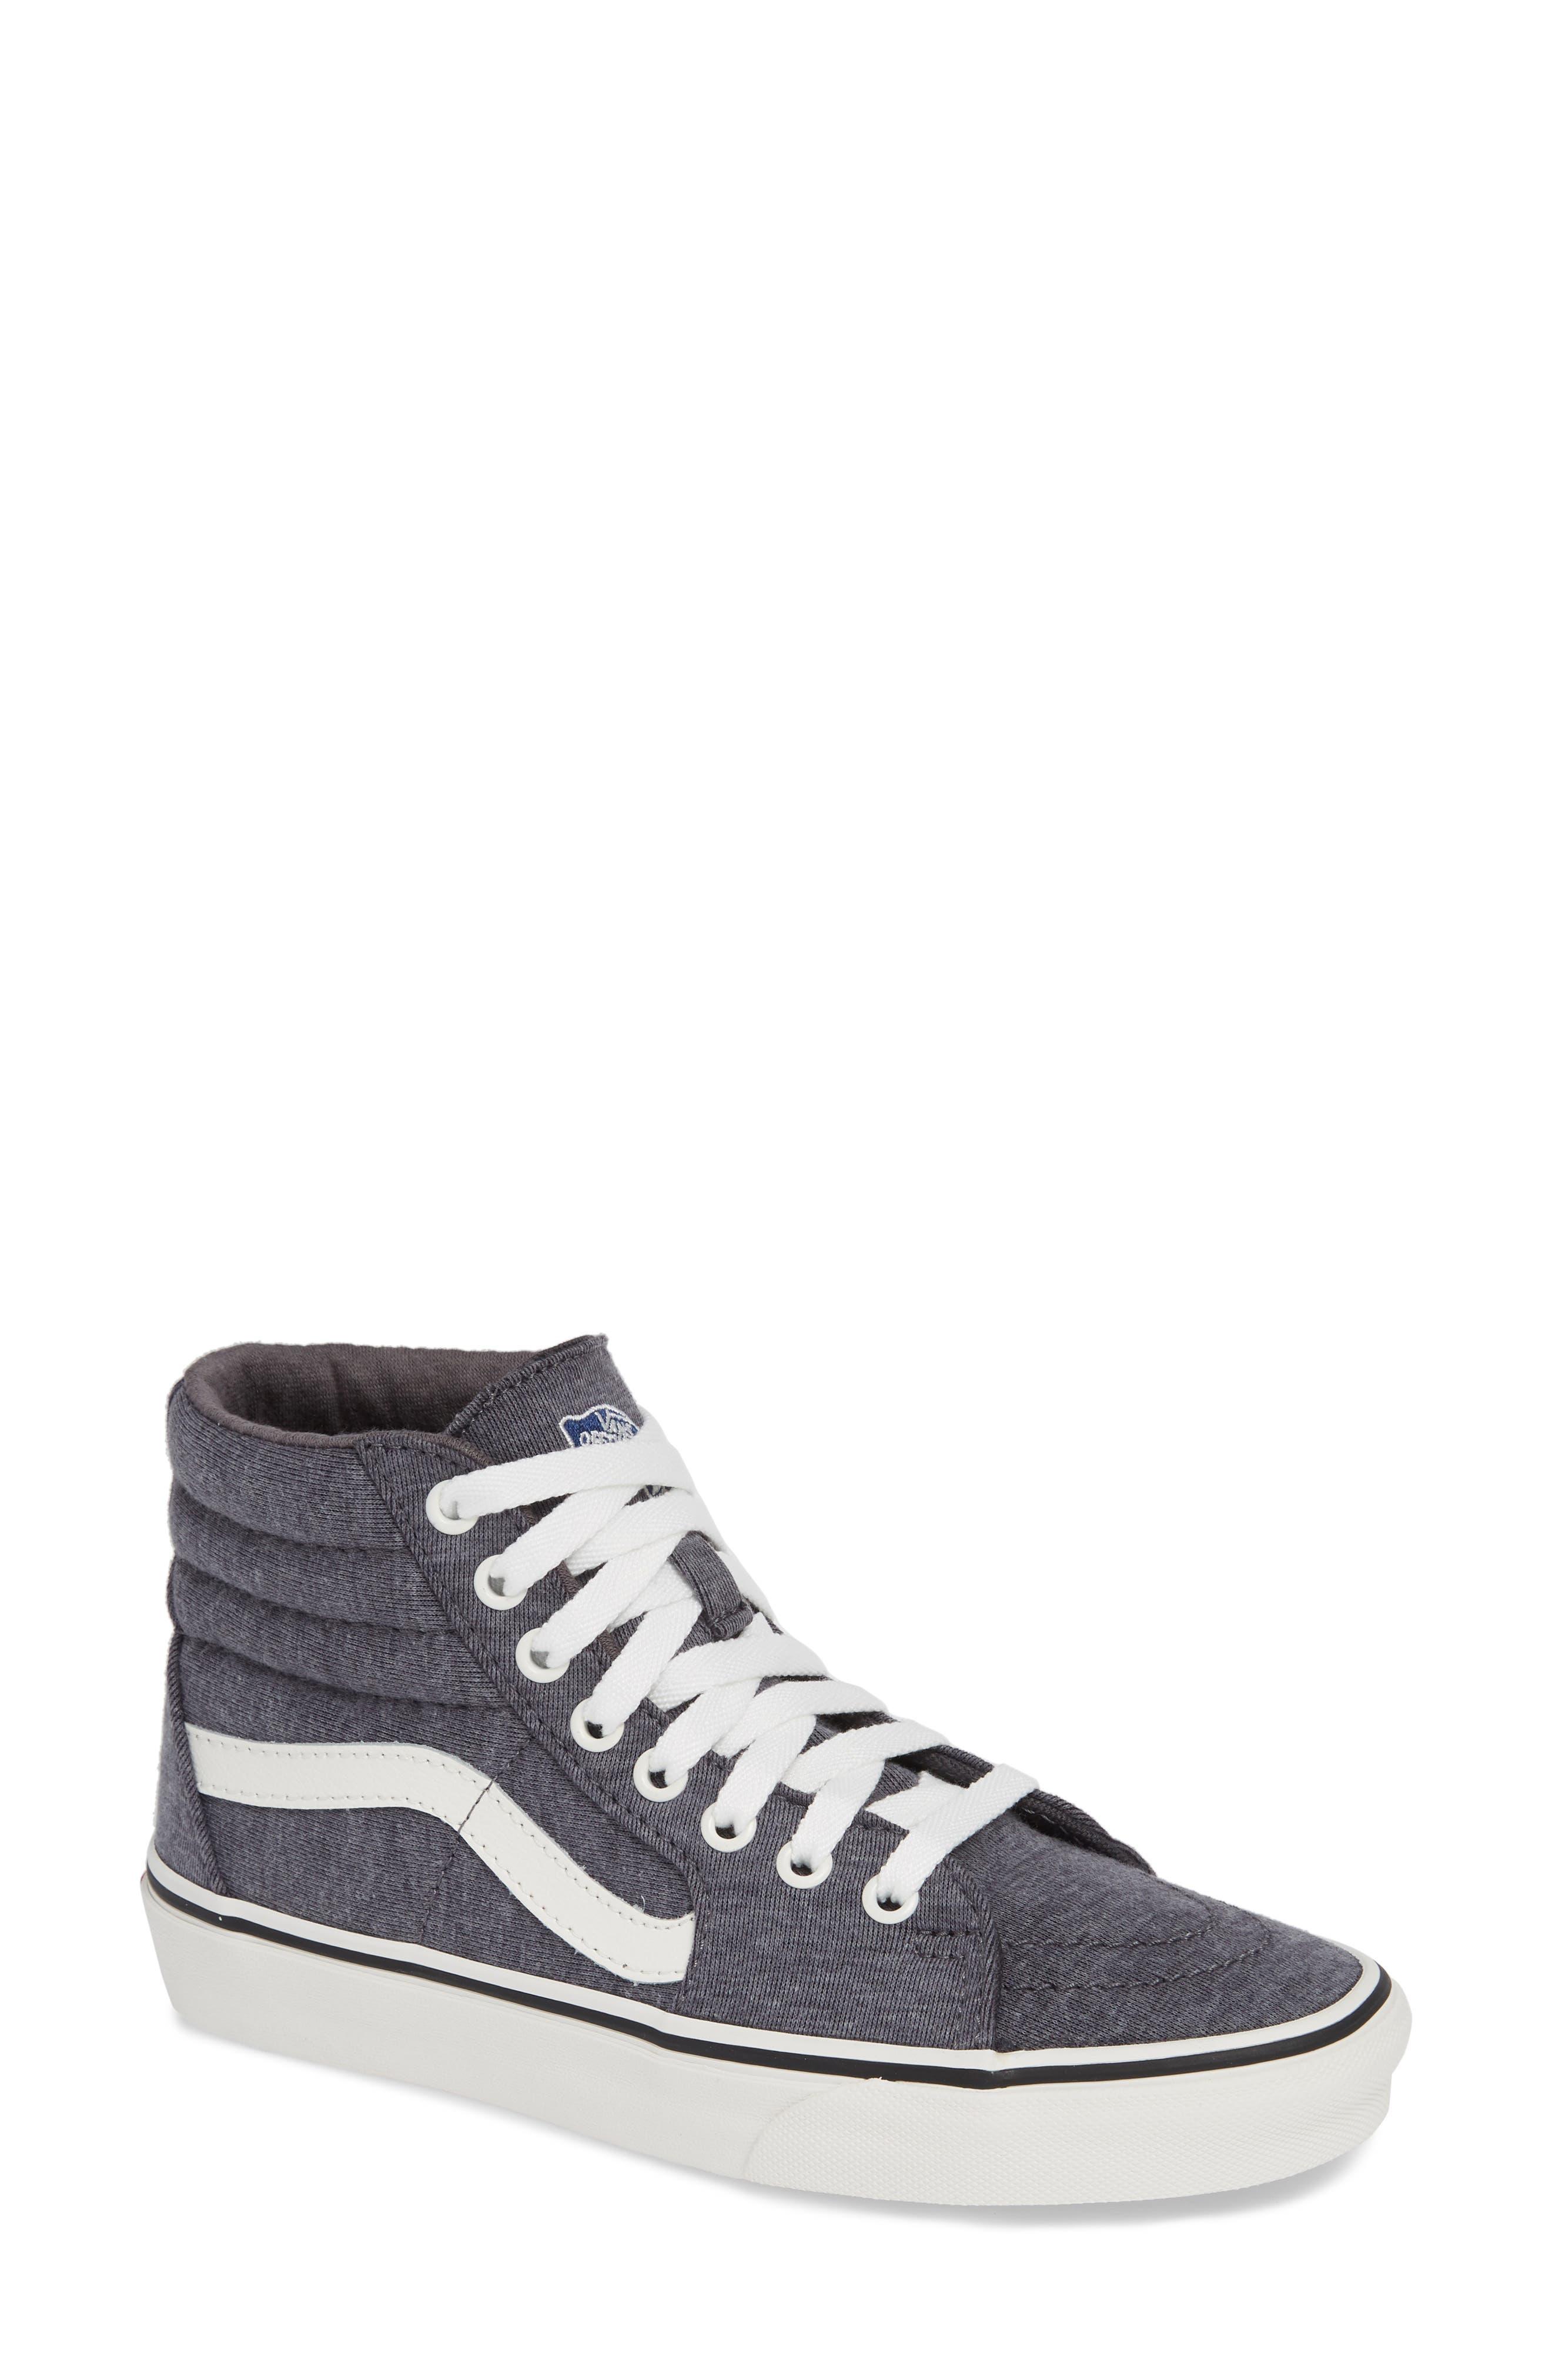 'Sk8-Hi' Sneaker,                             Main thumbnail 1, color,                             GREY/ SNOW WHITE